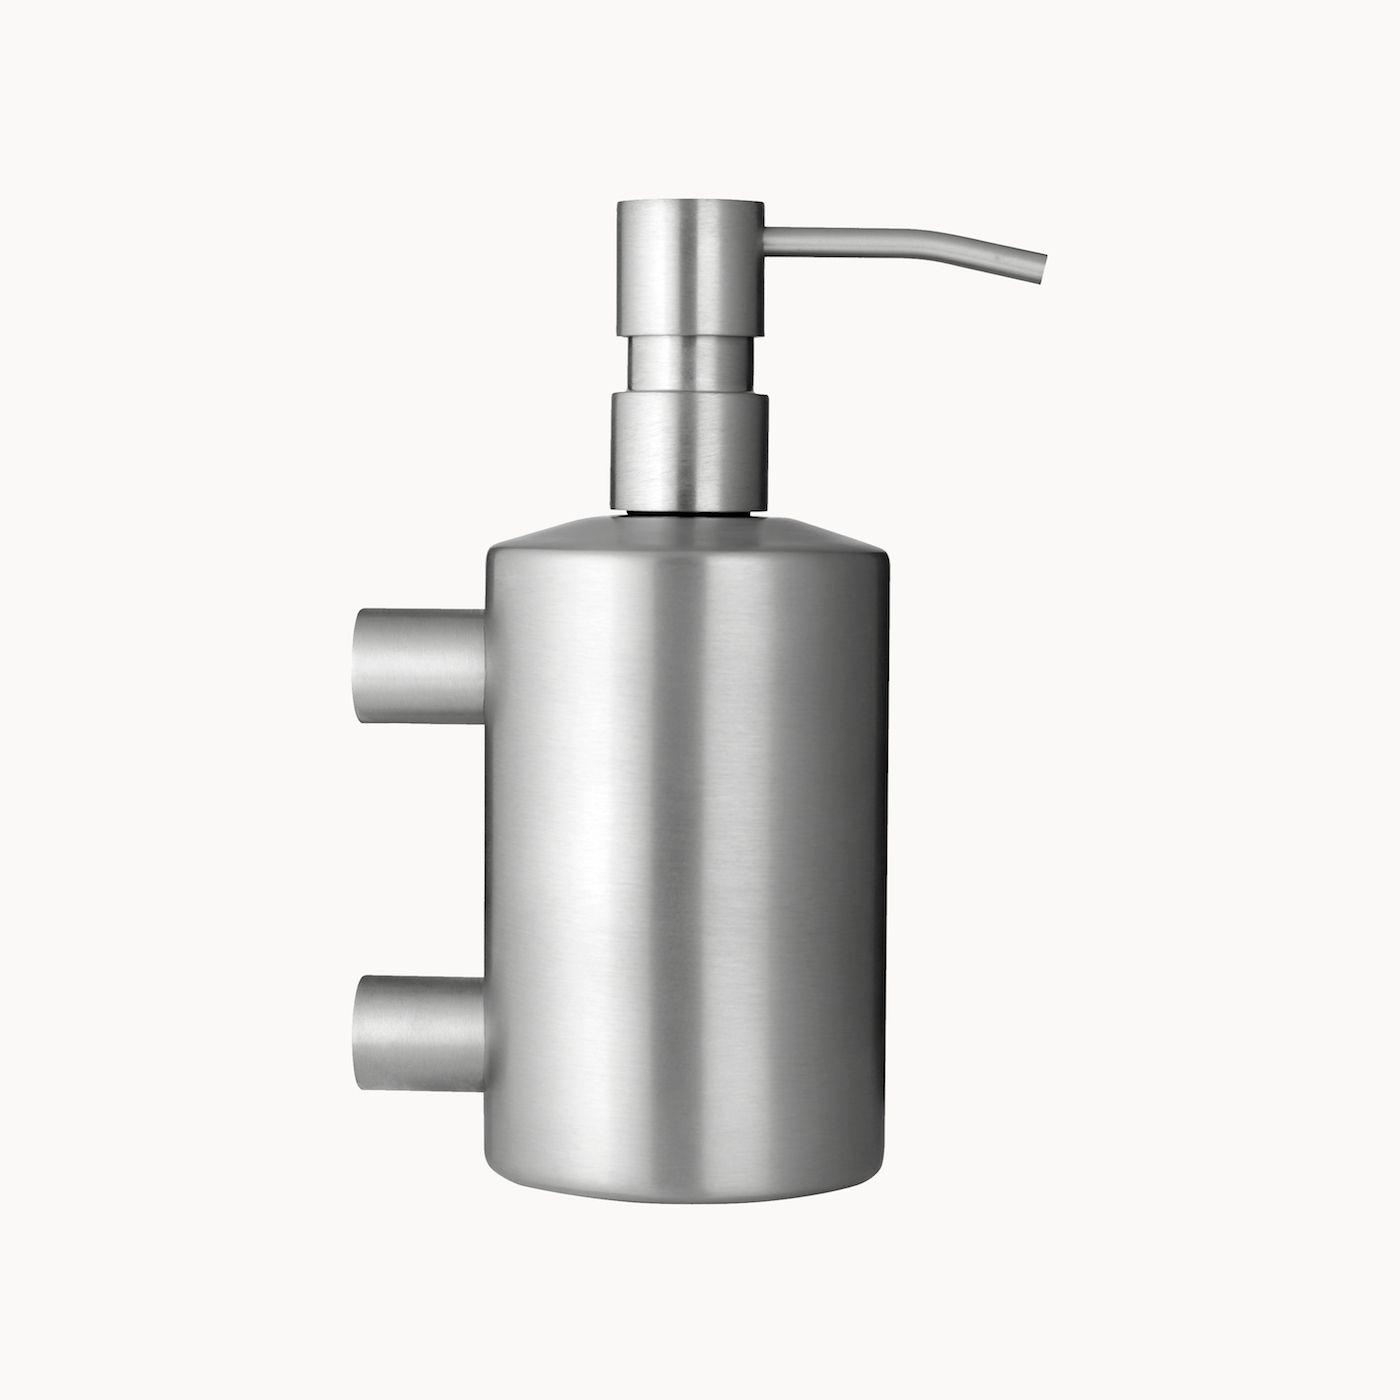 Modern Wall Mounted Soap Dispenser Sensor Soap Dispenser Liquid Soap Dispenser In 2020 Wall Mounted Soap Dispenser Soap Dispenser Liquid Soap